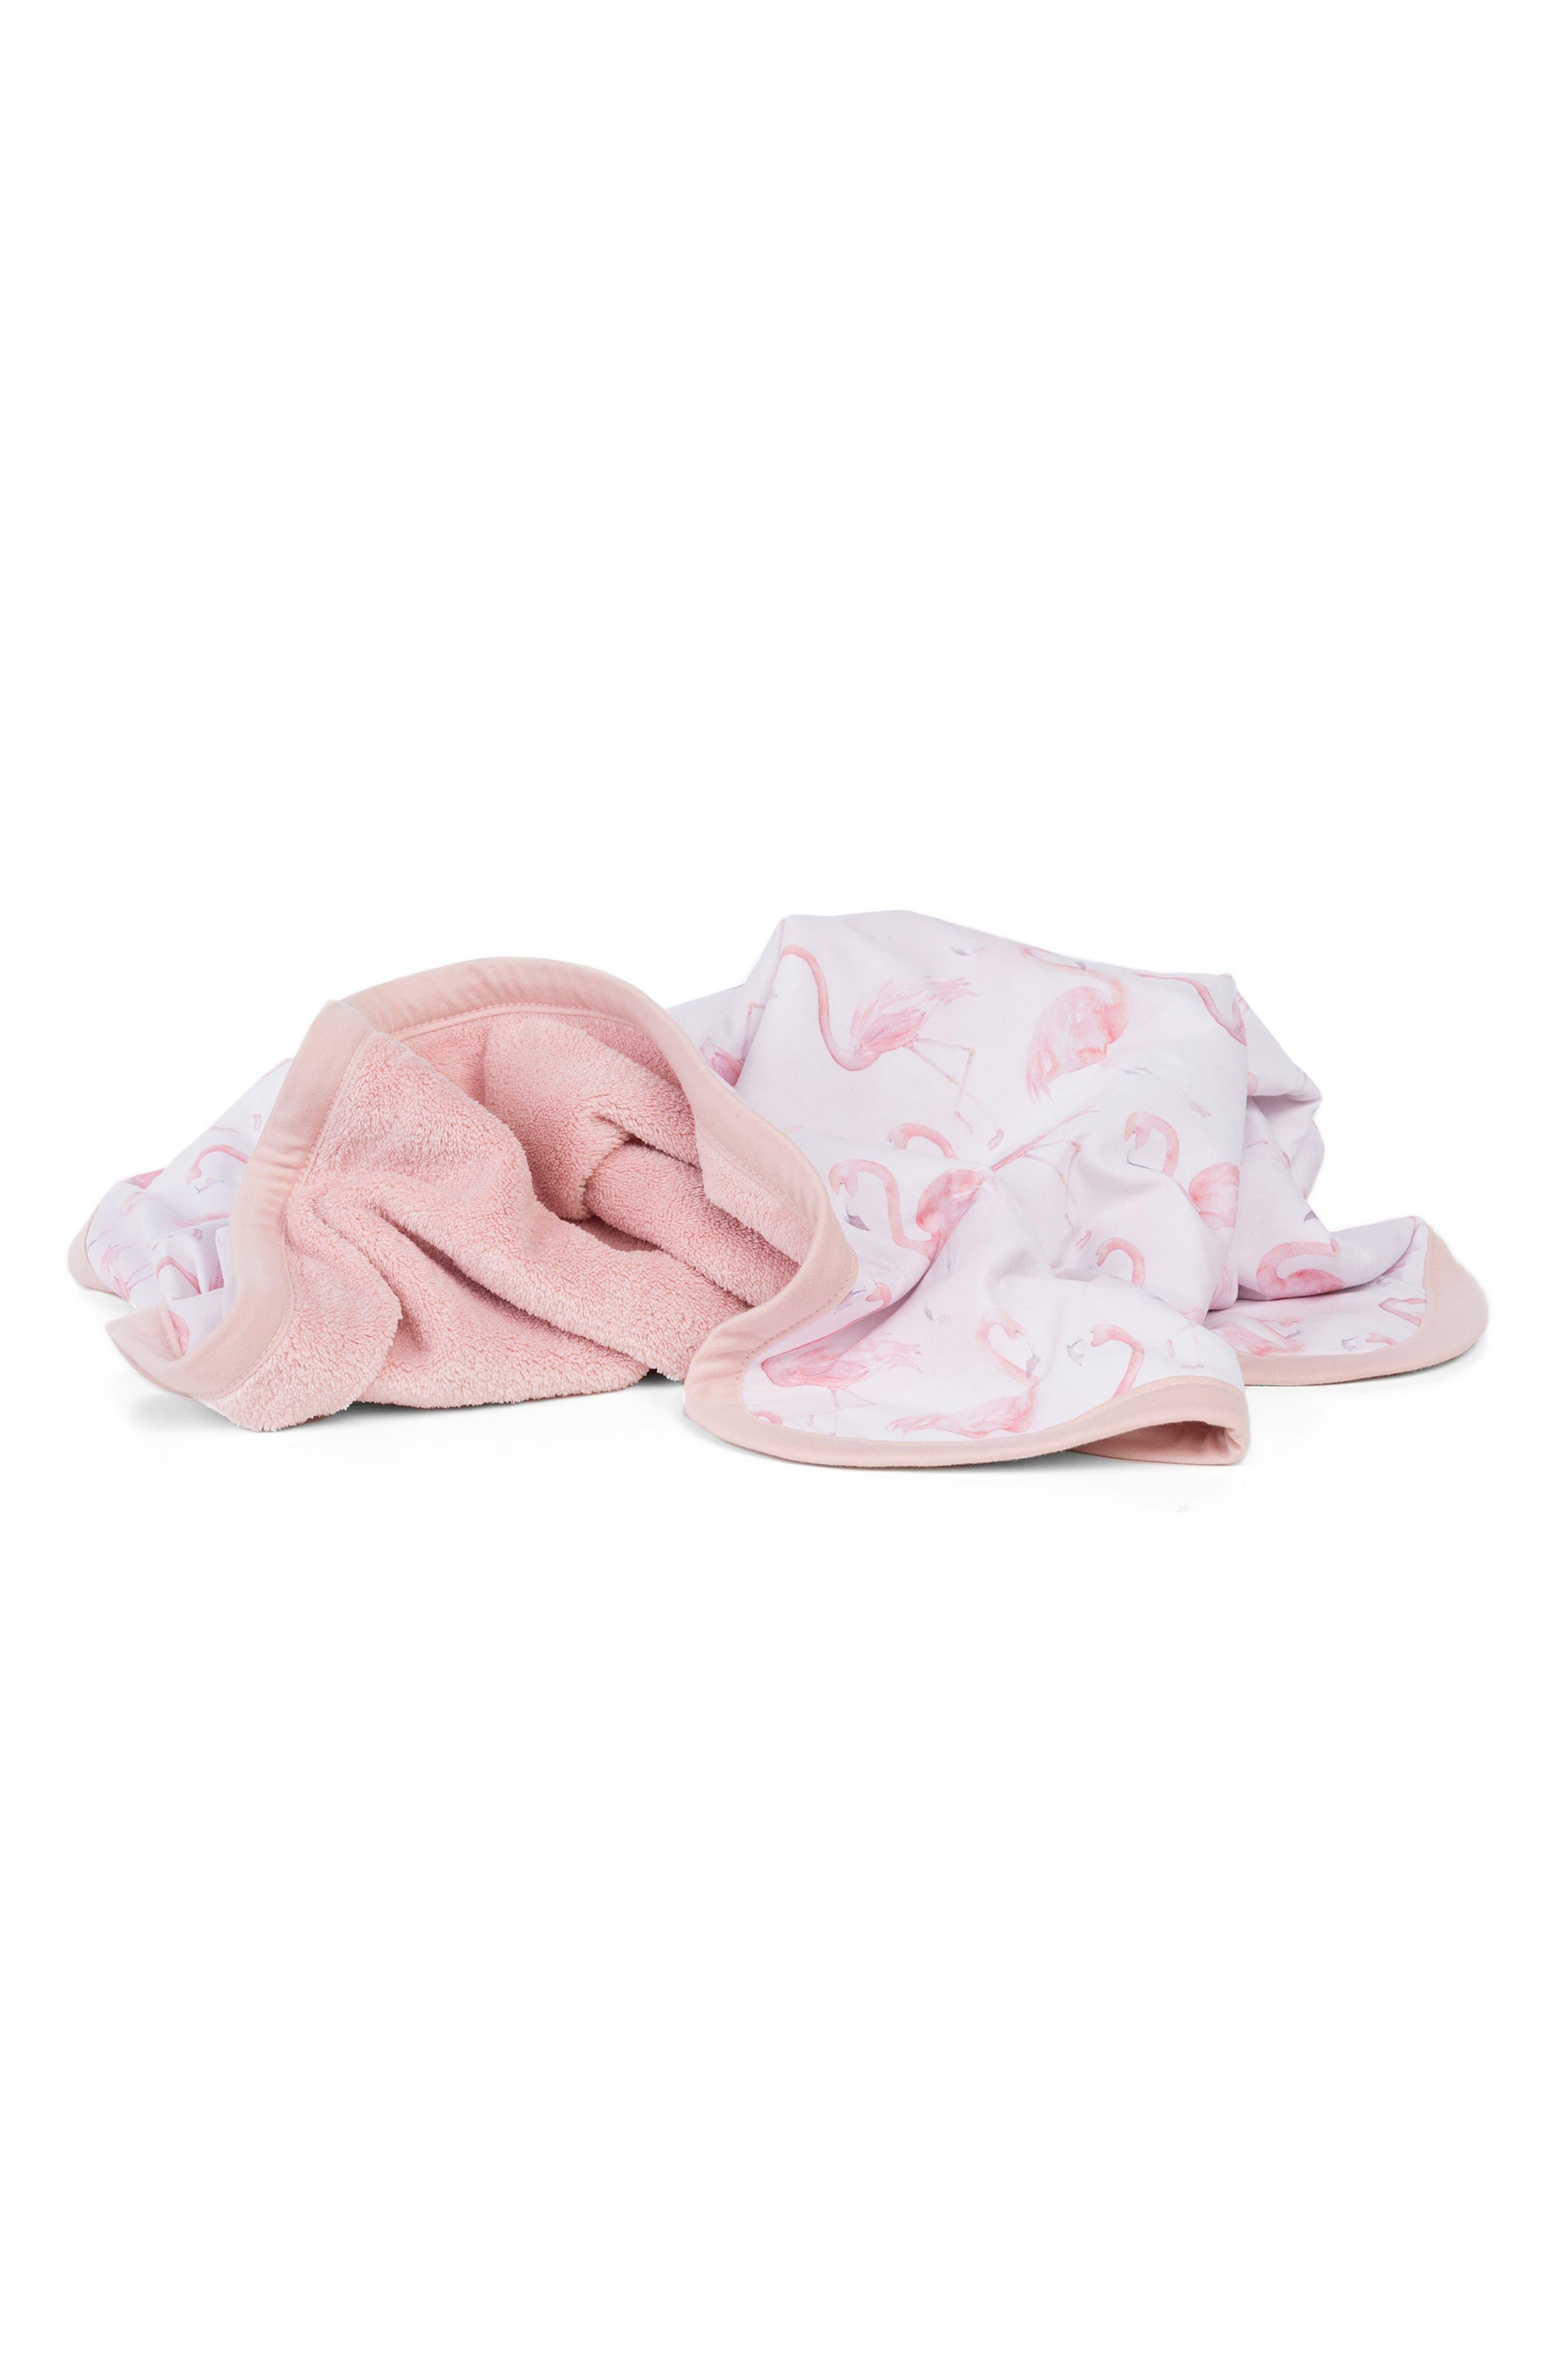 OILO, Flamingo Cuddle Blanket, Main thumbnail 1, color, BLUSH